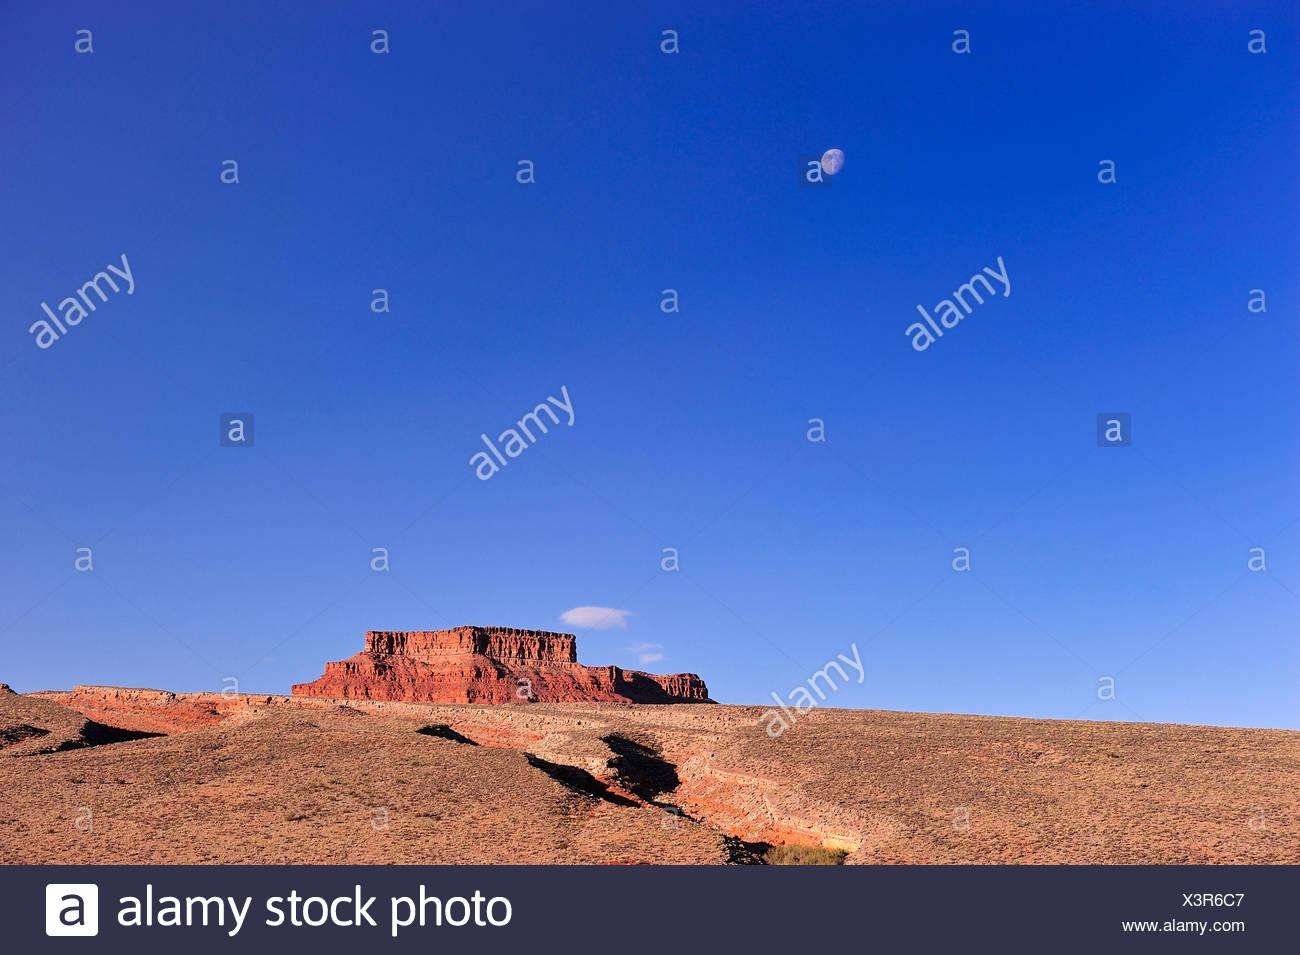 Landscapes, Cedar Mesa, near Bluff, Colorado Plateau, Utah, USA, United States, America, landscape - Stock Image